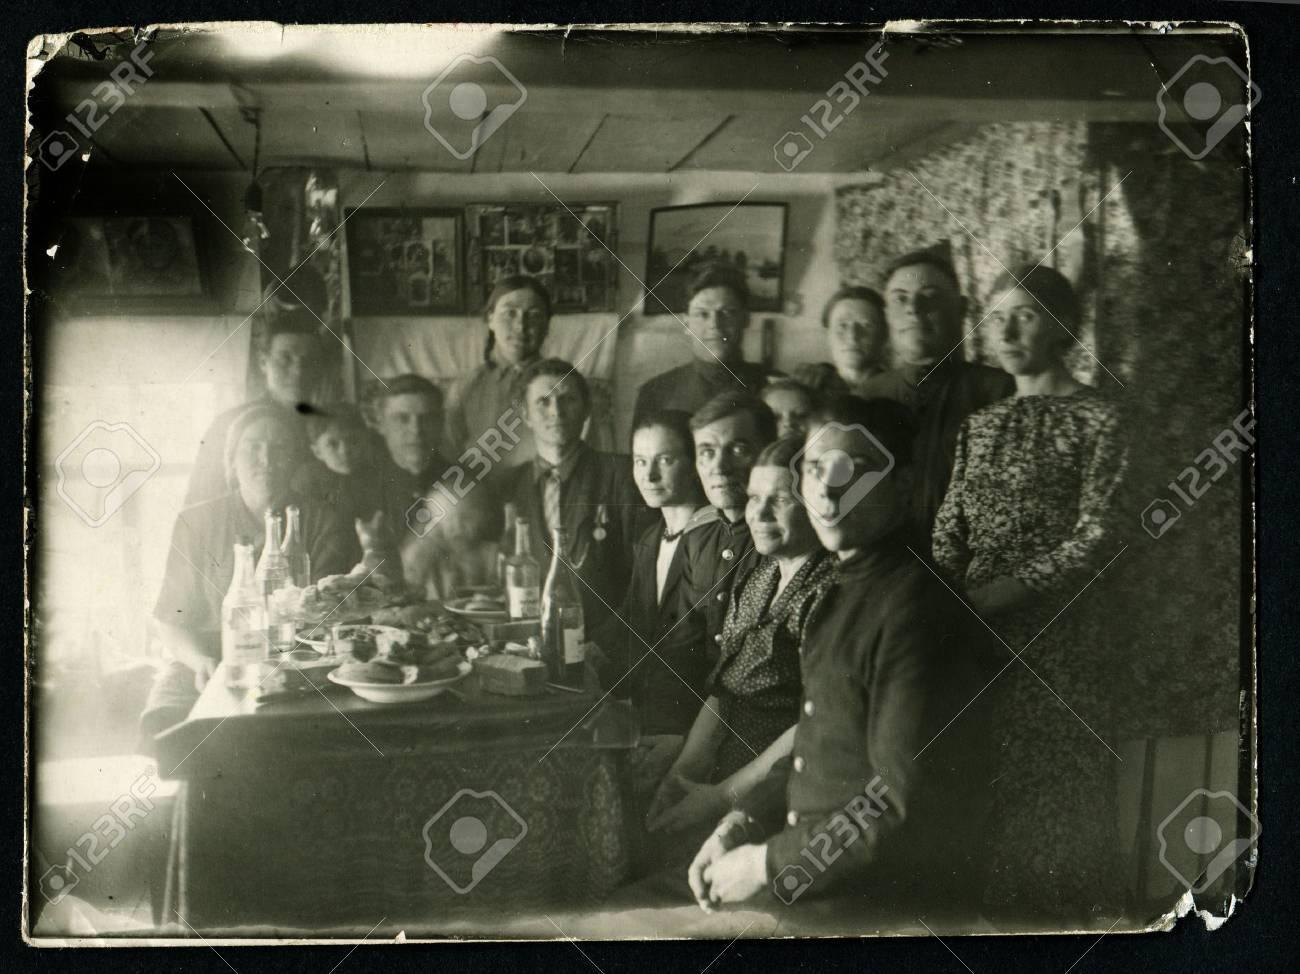 Stock photo ussr circa 1960s an antique black white photo show festive feast